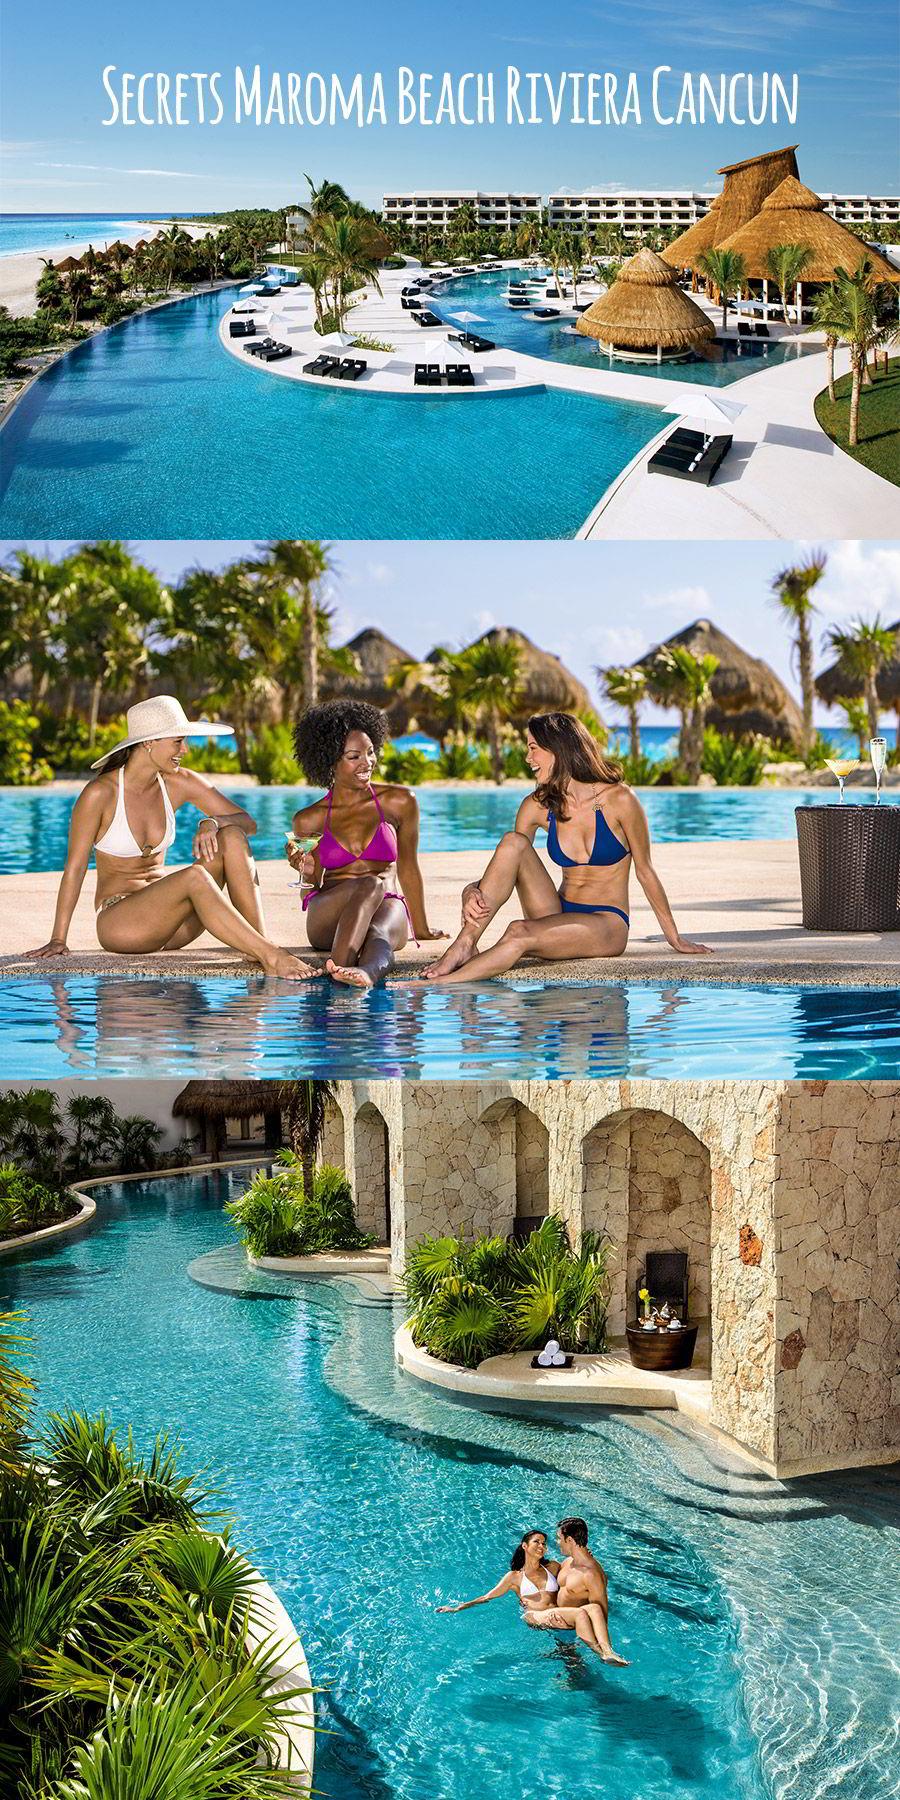 secrets resorts maroma beach riviera cancun mexico destination wedding venue honeymoon luxury resort beach pool side swim out suites